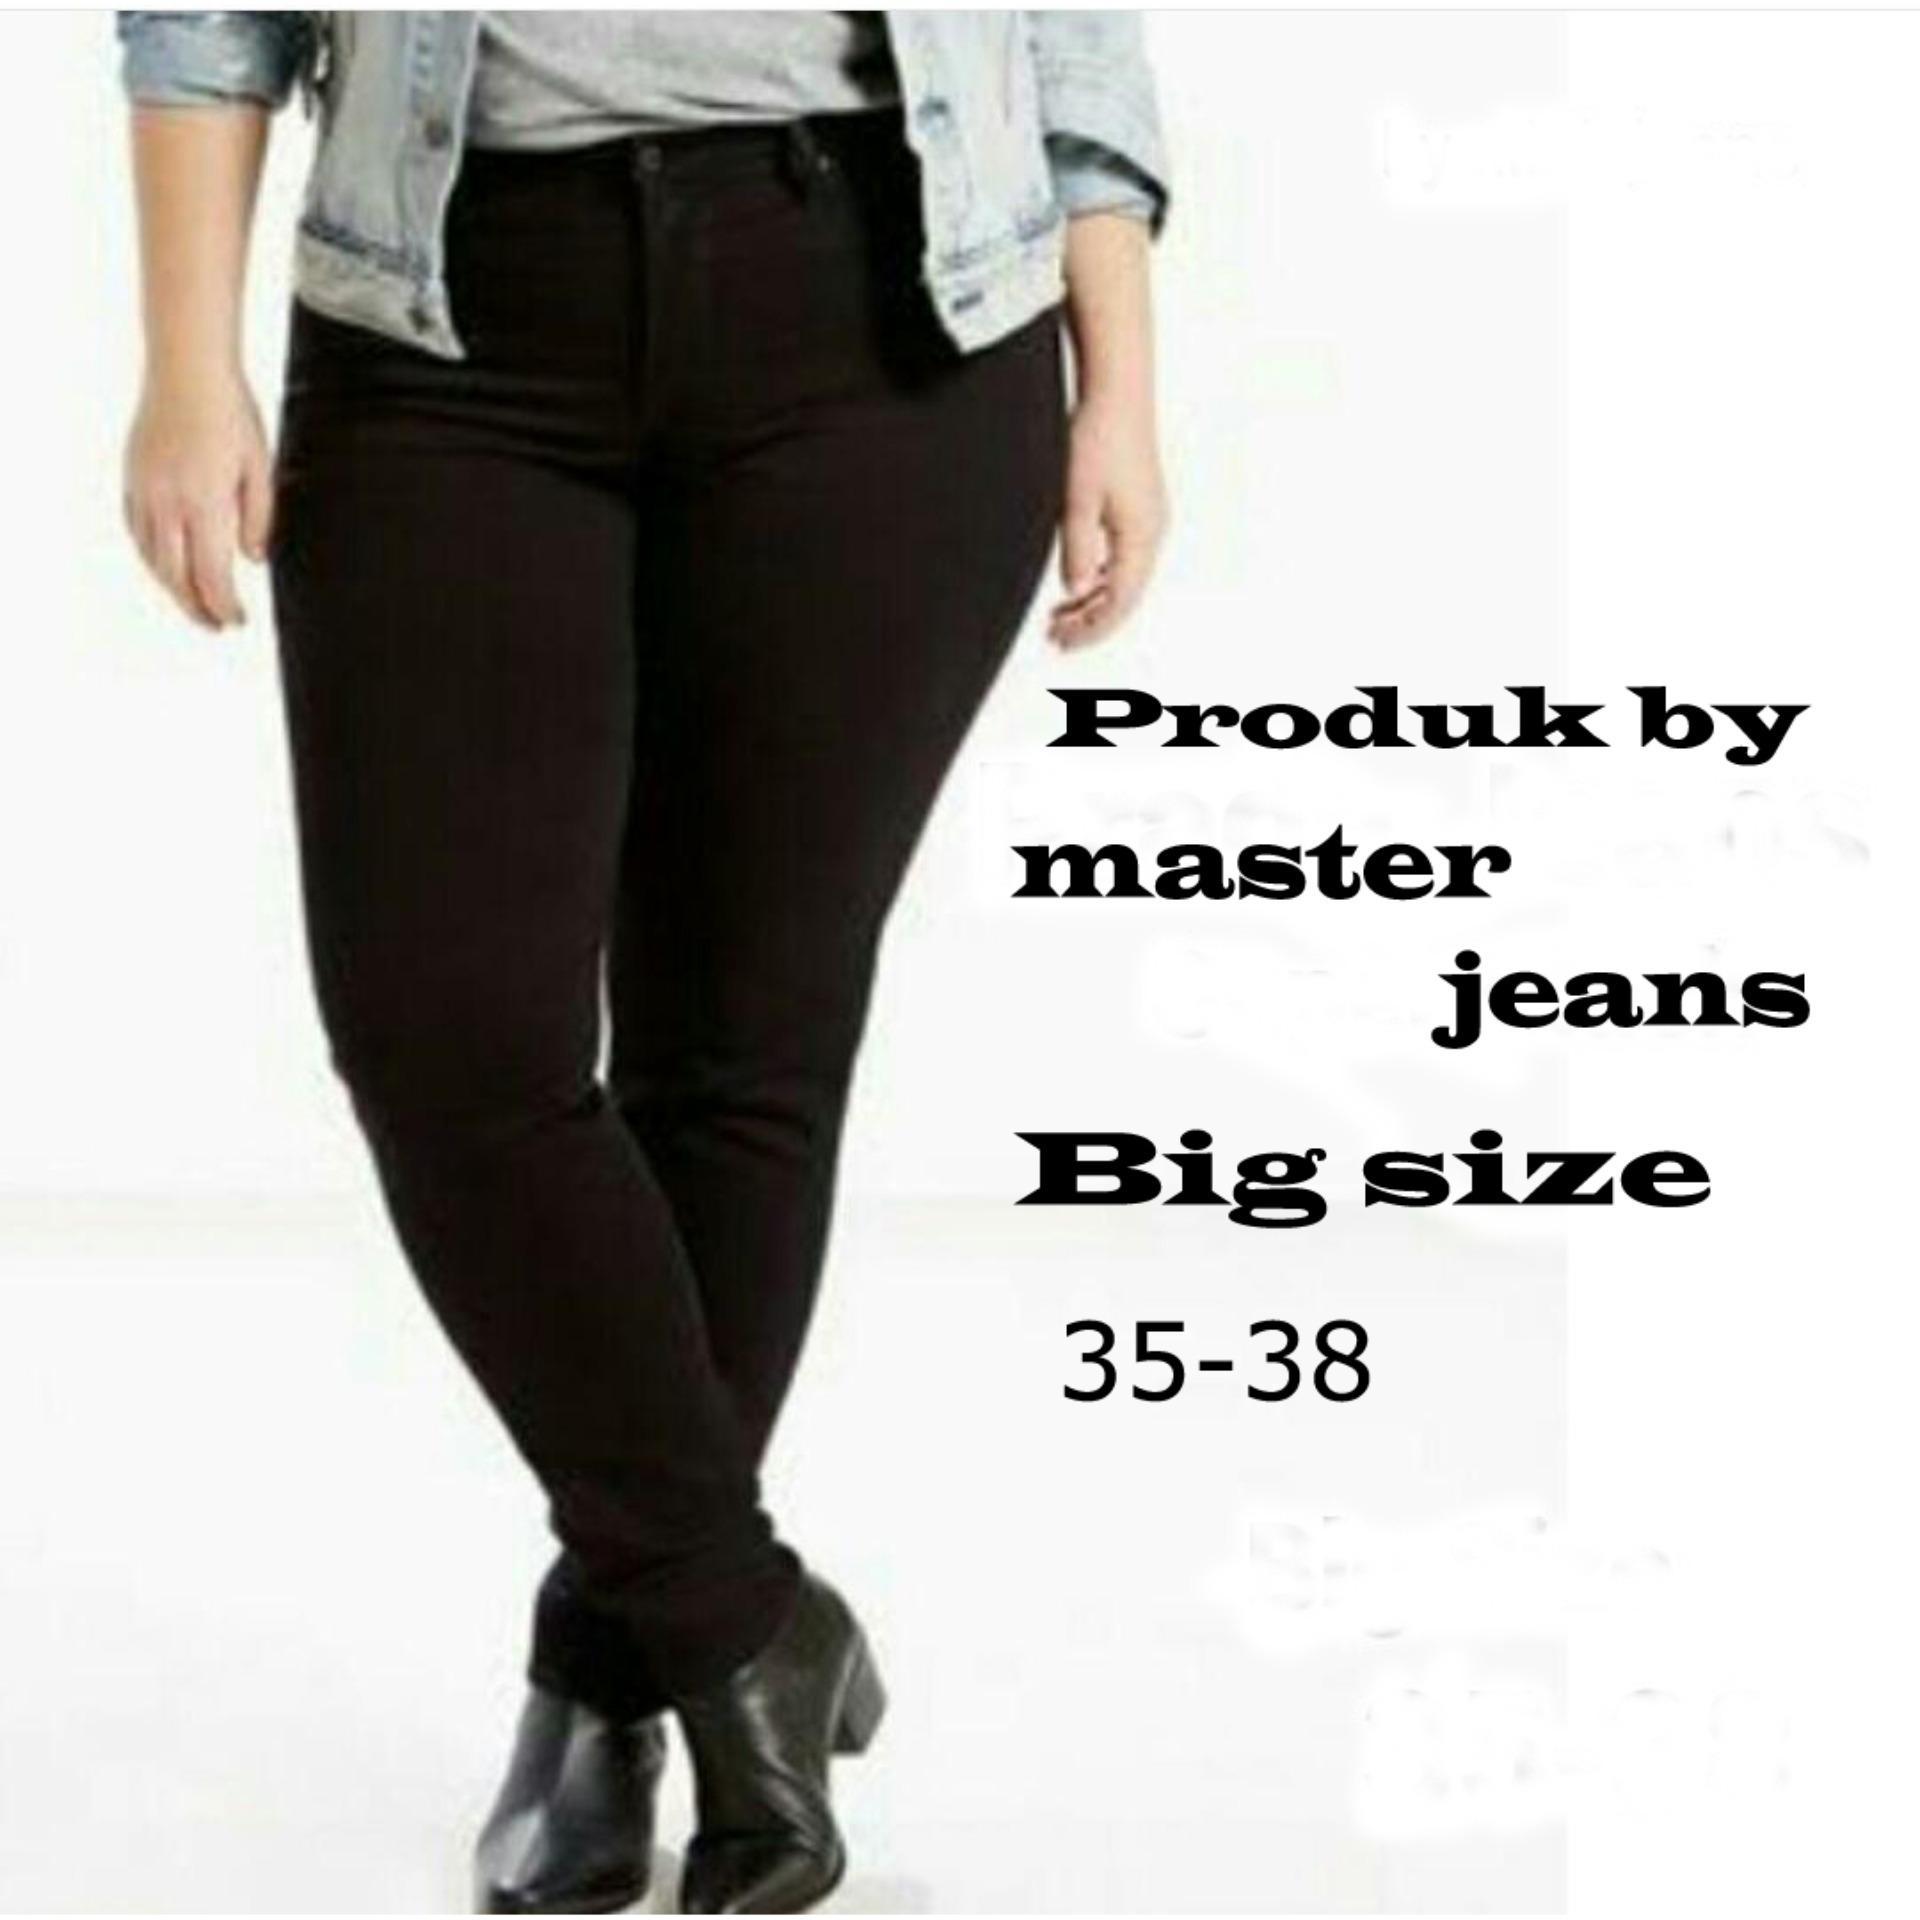 Master Jeans Celana Wanita Skinny Big Size Daftar Update Harga Flash Sale Hitam